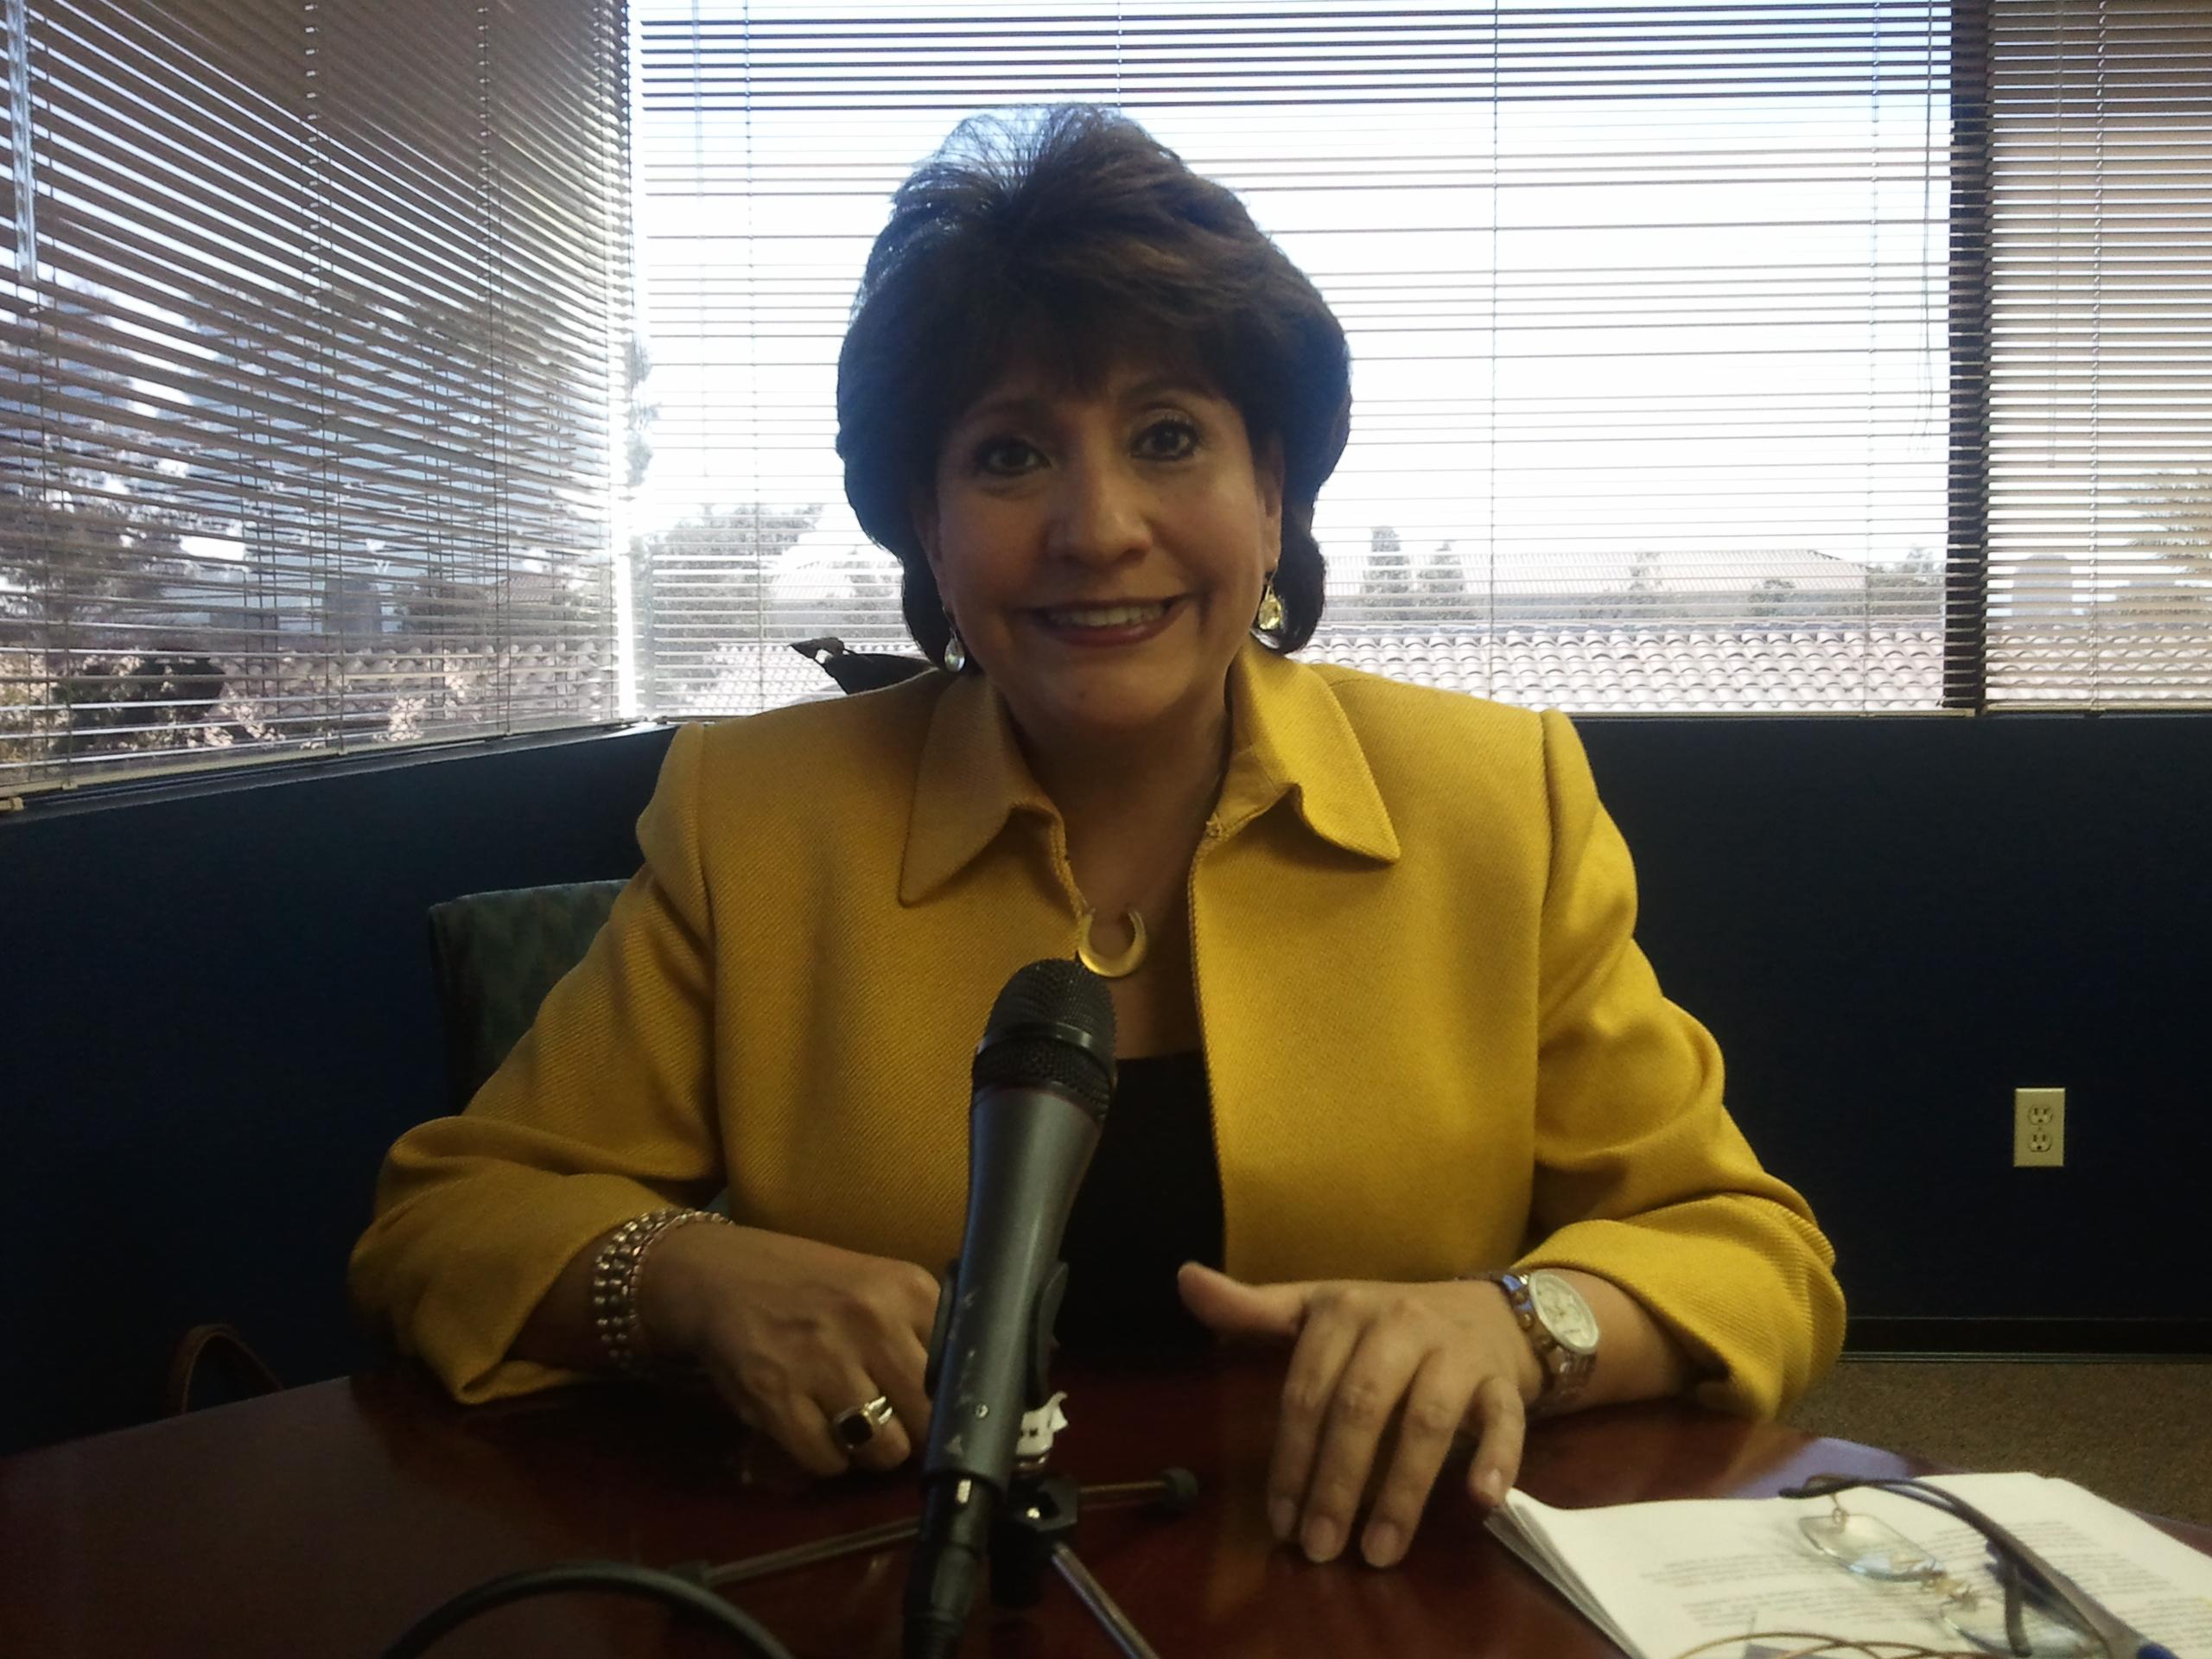 Janet Murguía, National Council of La Raza CEO